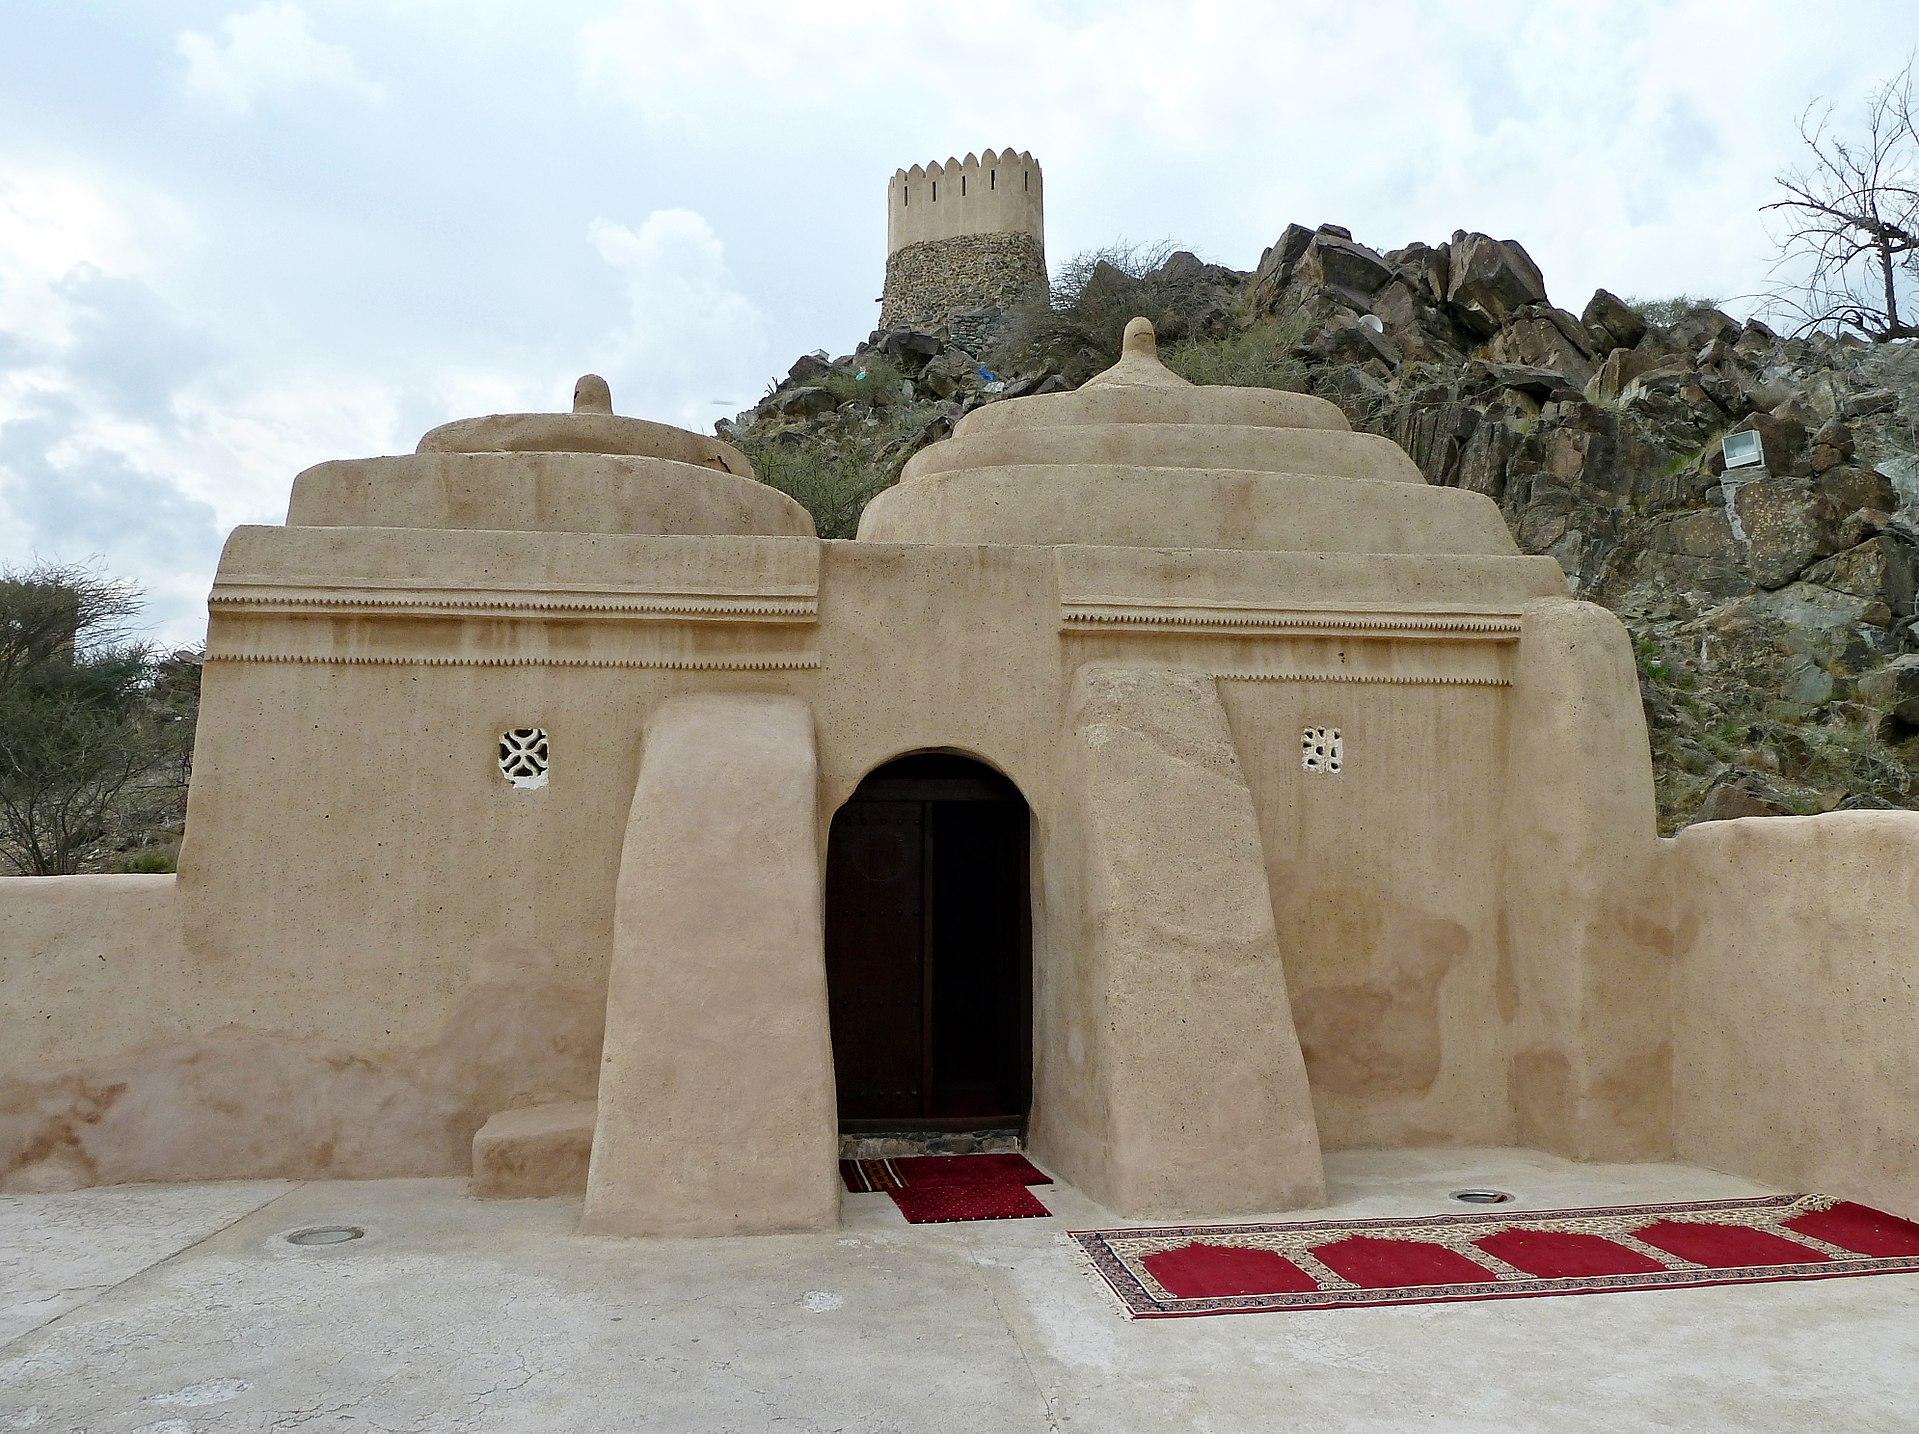 Mosque Wikipedia: Al Badiyah Mosque